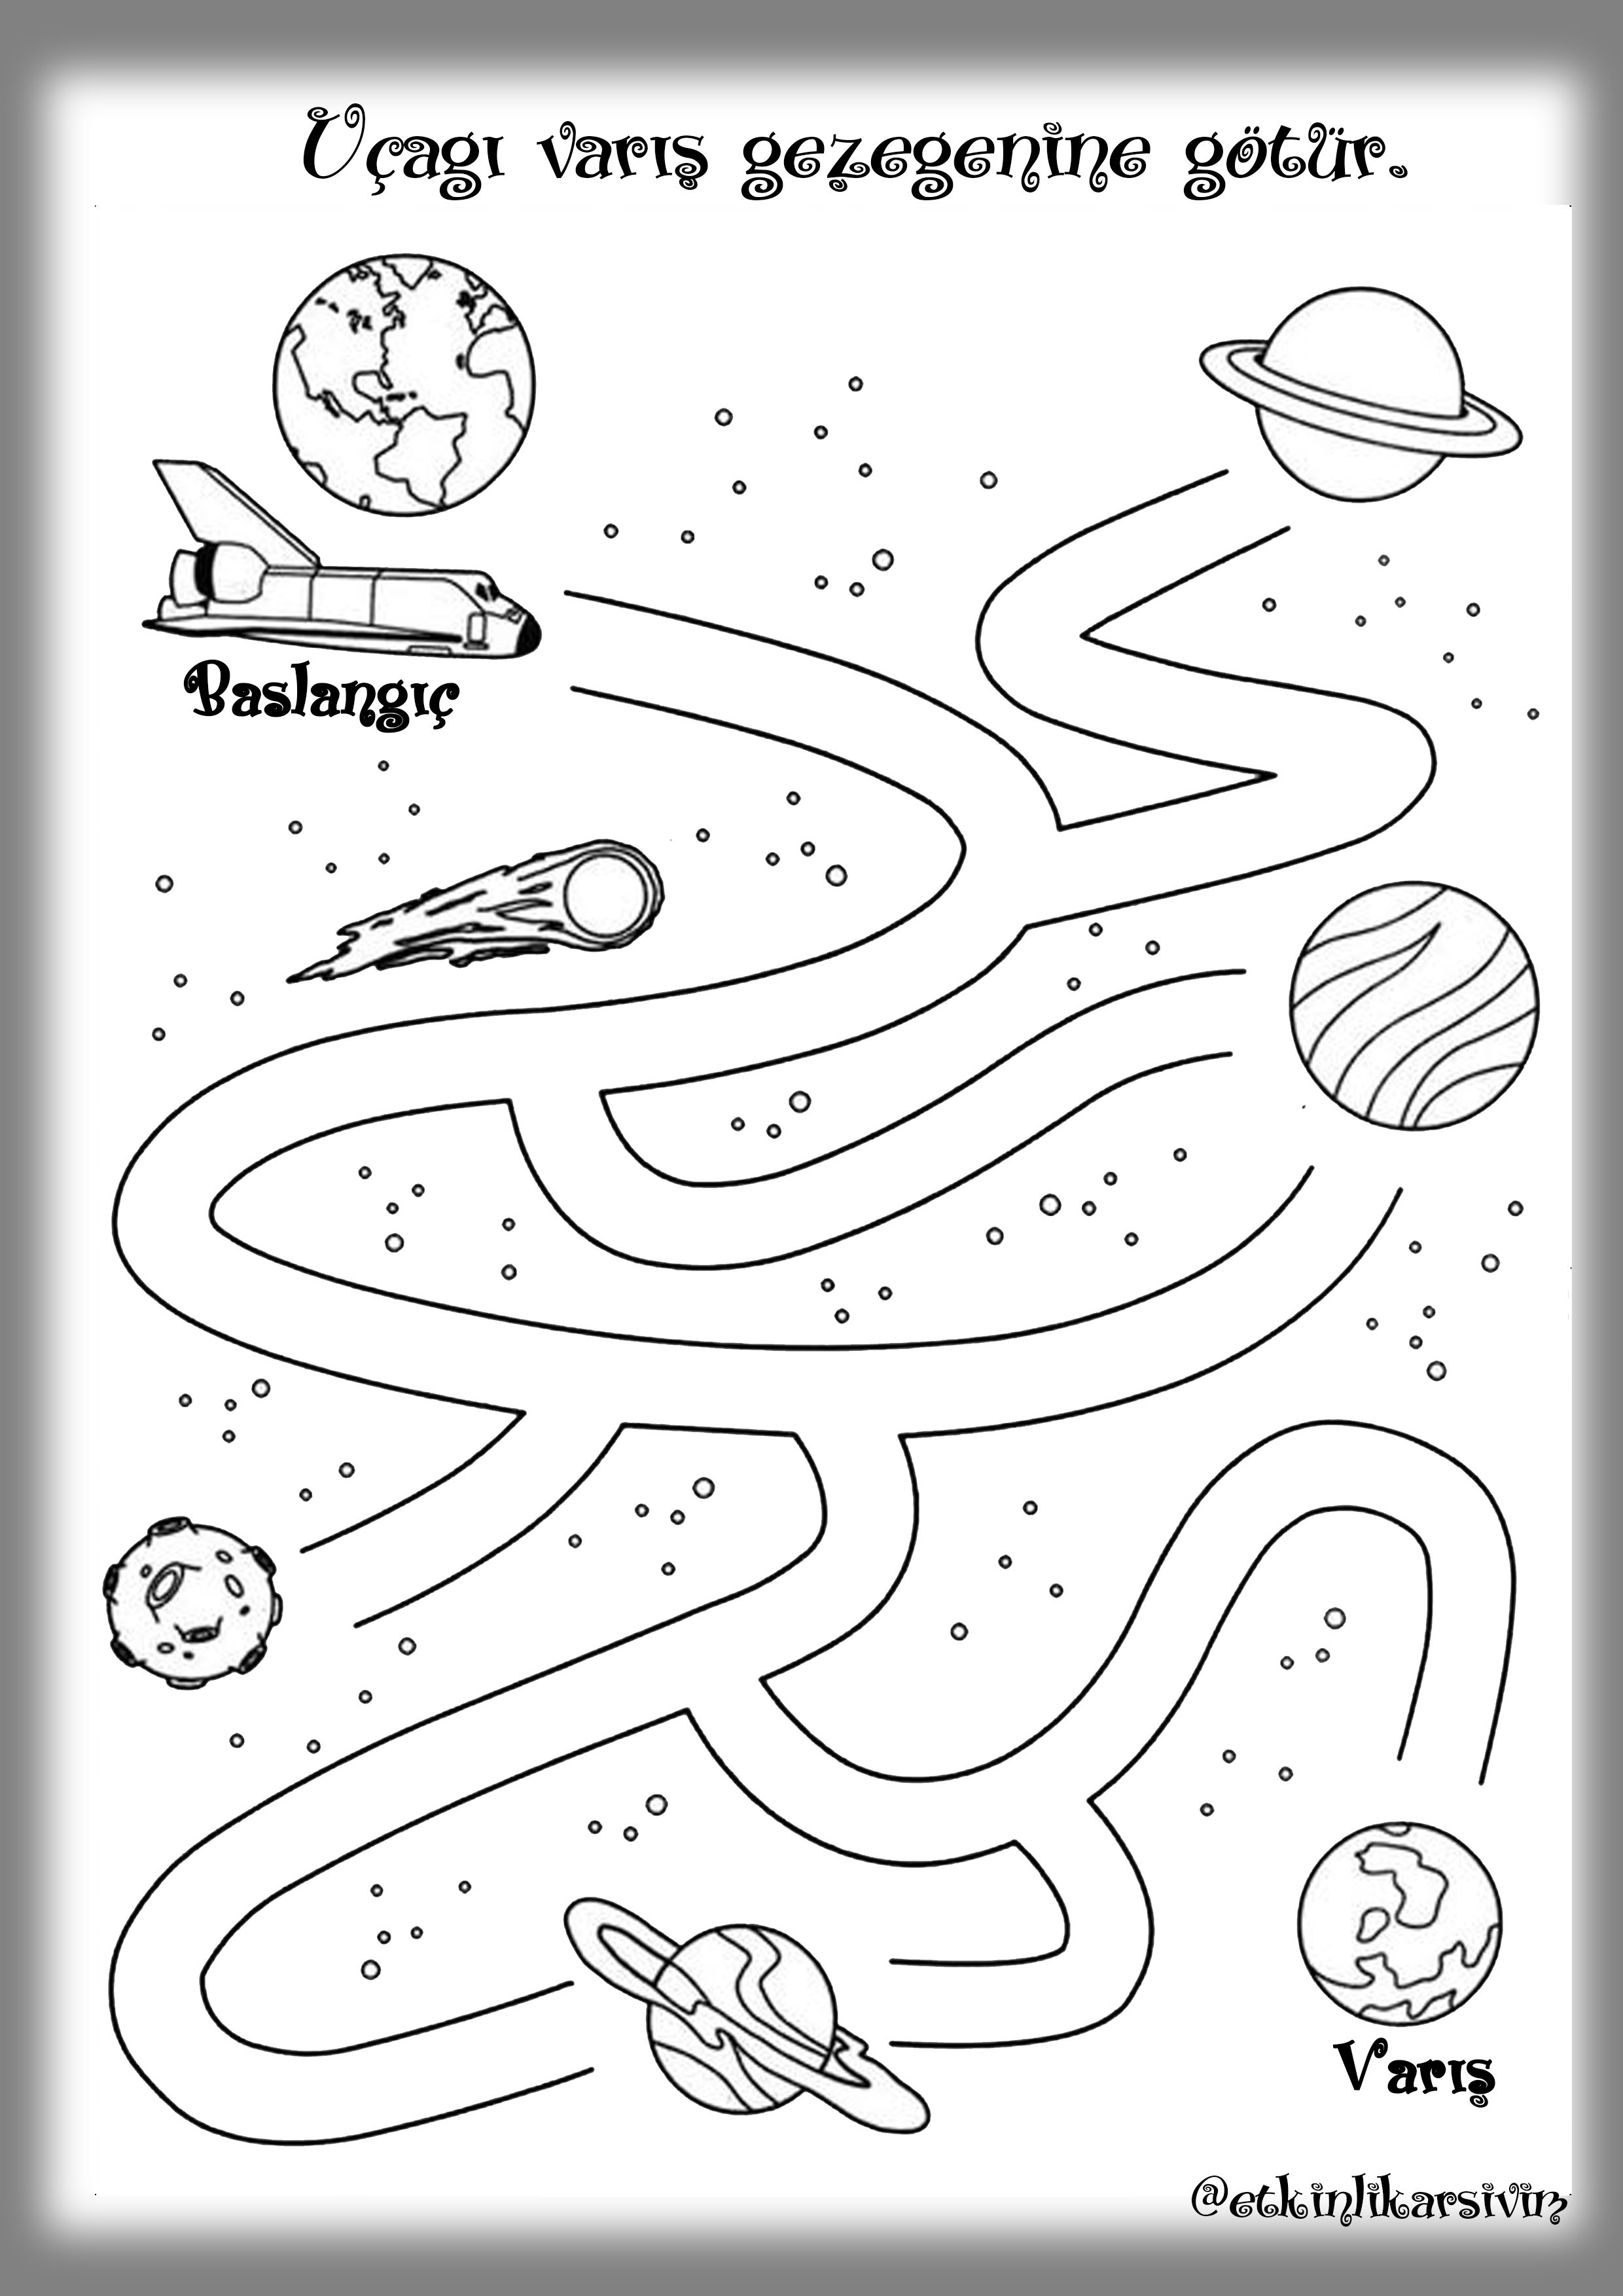 Pin by Meral Yılmaz on space | Pinterest | Maze, Sistemul solar and ...